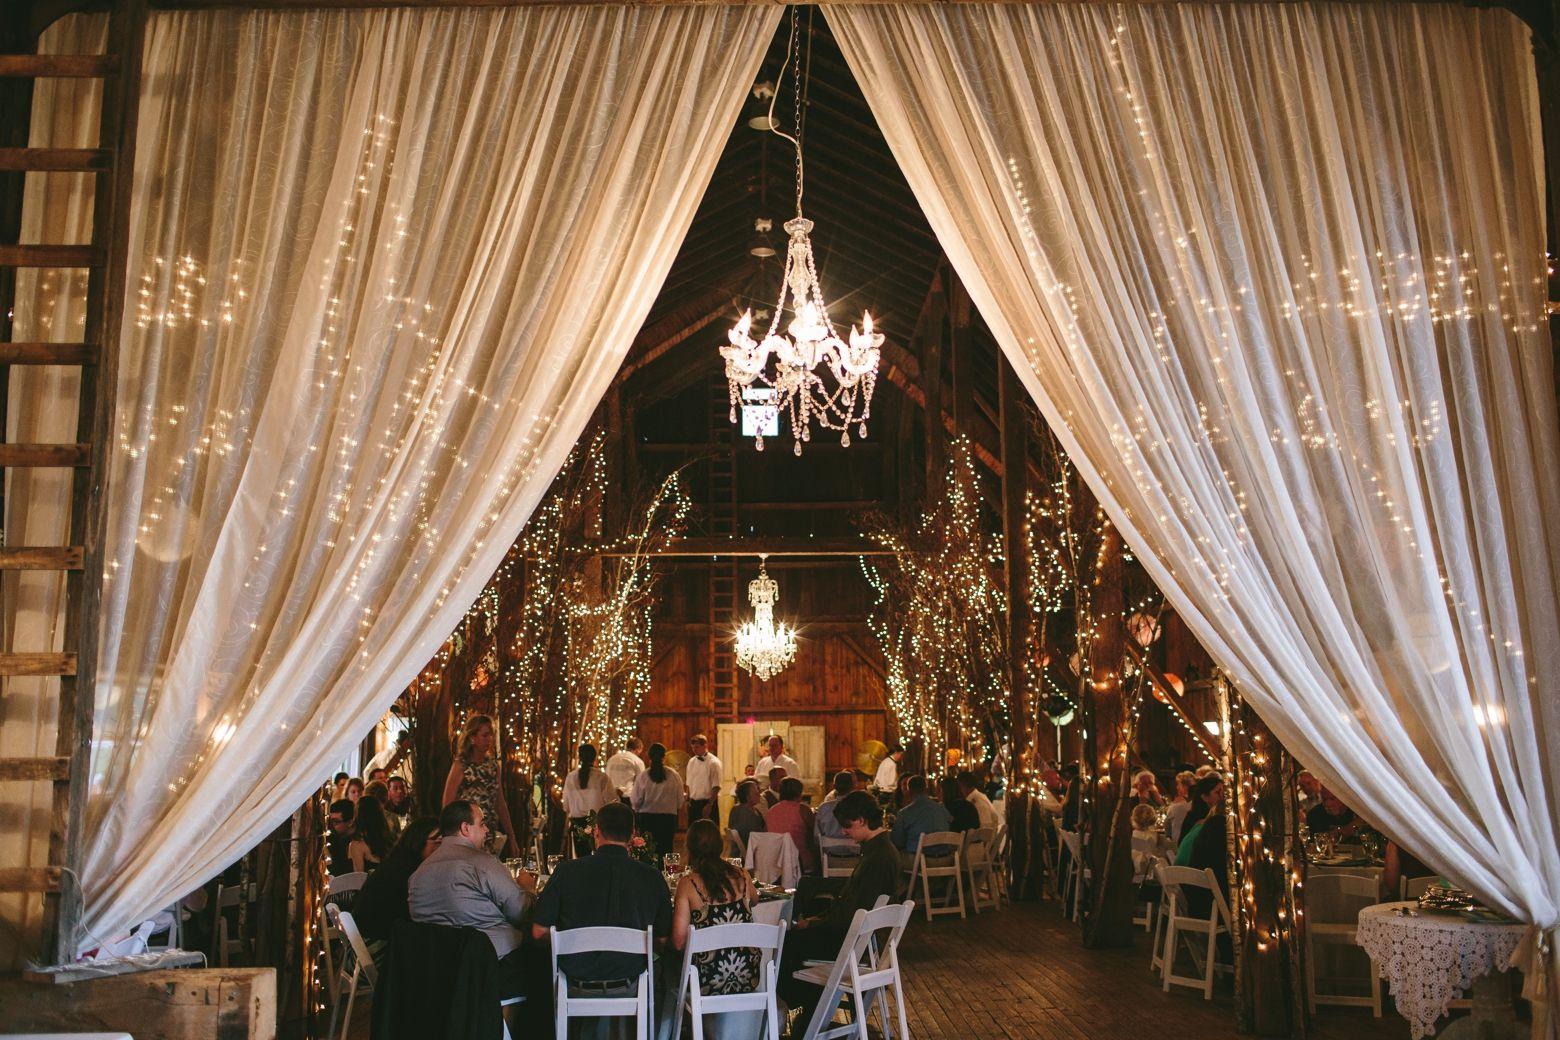 Elegant Small Cheap Wedding Venues Near Me: 30 Best Rustic, Outdoors, Eclectic, Unique Beautiful